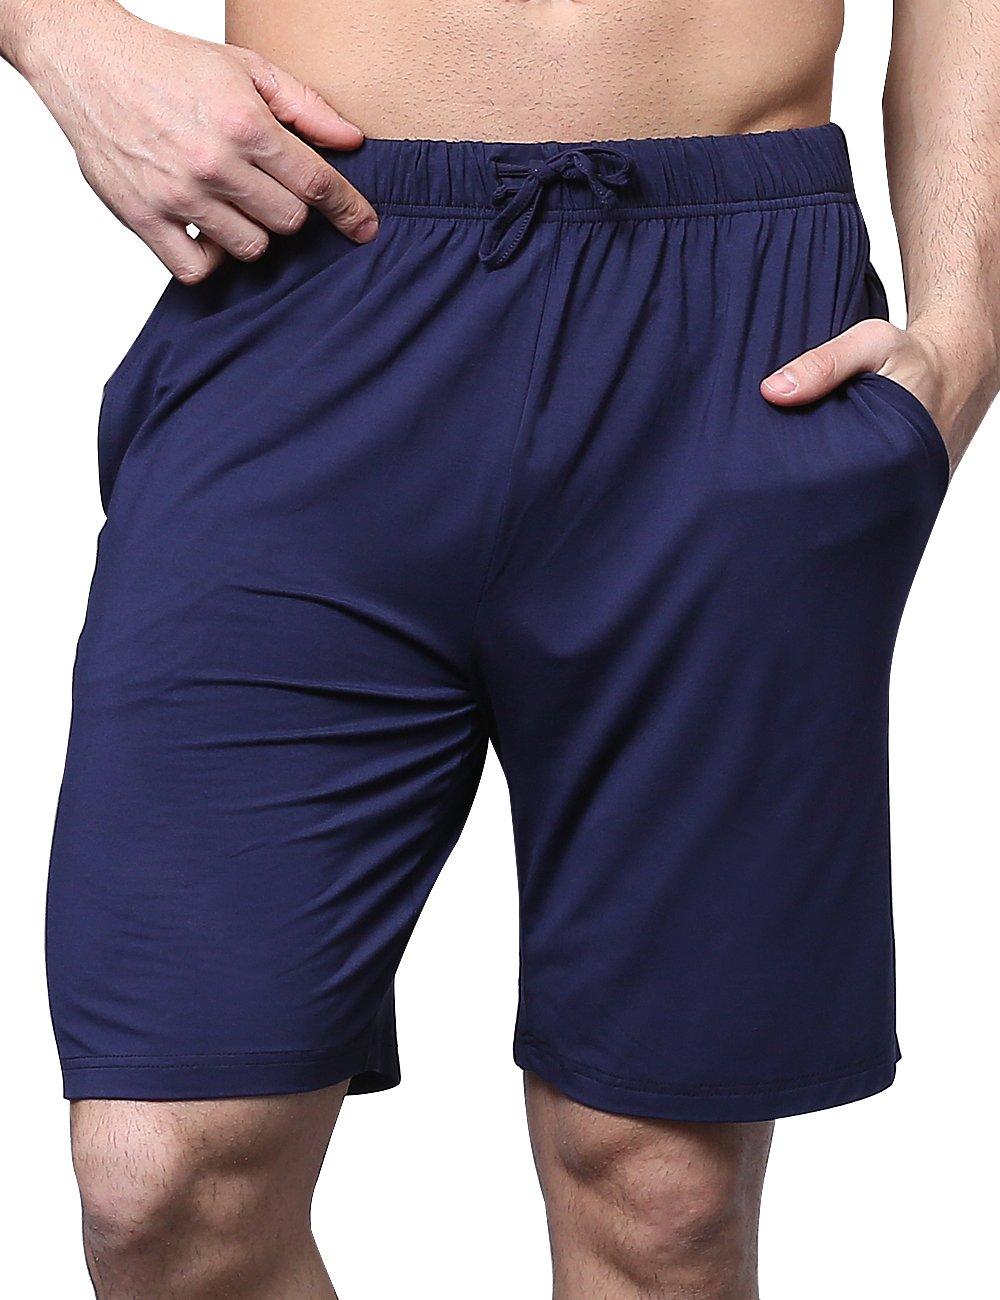 GYS Men's Bamboo Pajama Bottom Lounge Shorts (XL, Navy)